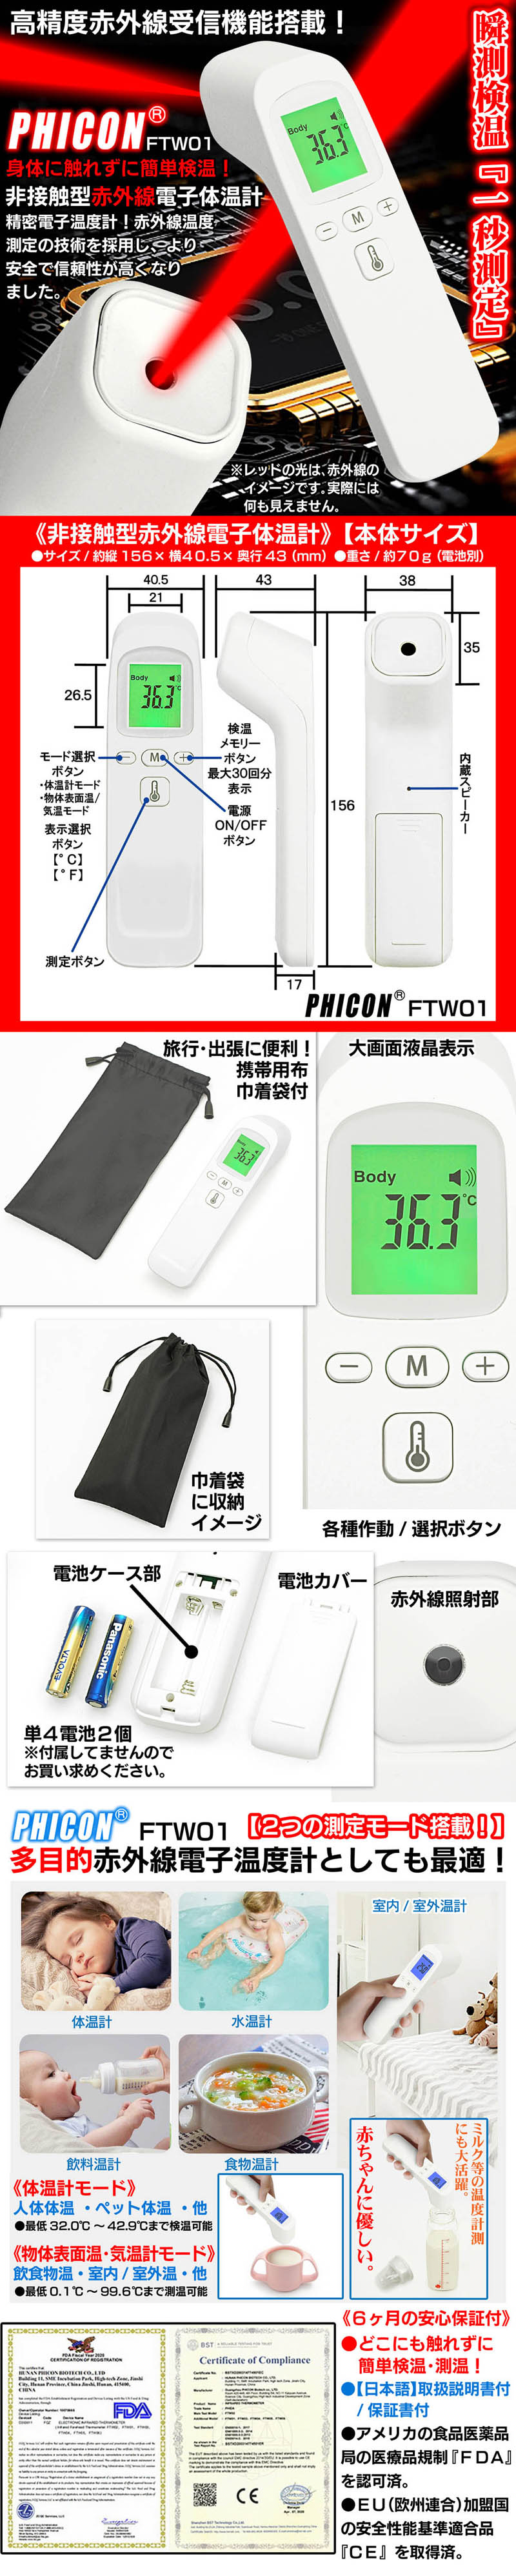 FTW01/非接触赤外線電子体温計/高精度一秒測定/大画面3色温度表示/飲食,物体,室内外温測定OK/日本語説明書,保証書,携帯用袋付/6ヶ月保証/PHICON